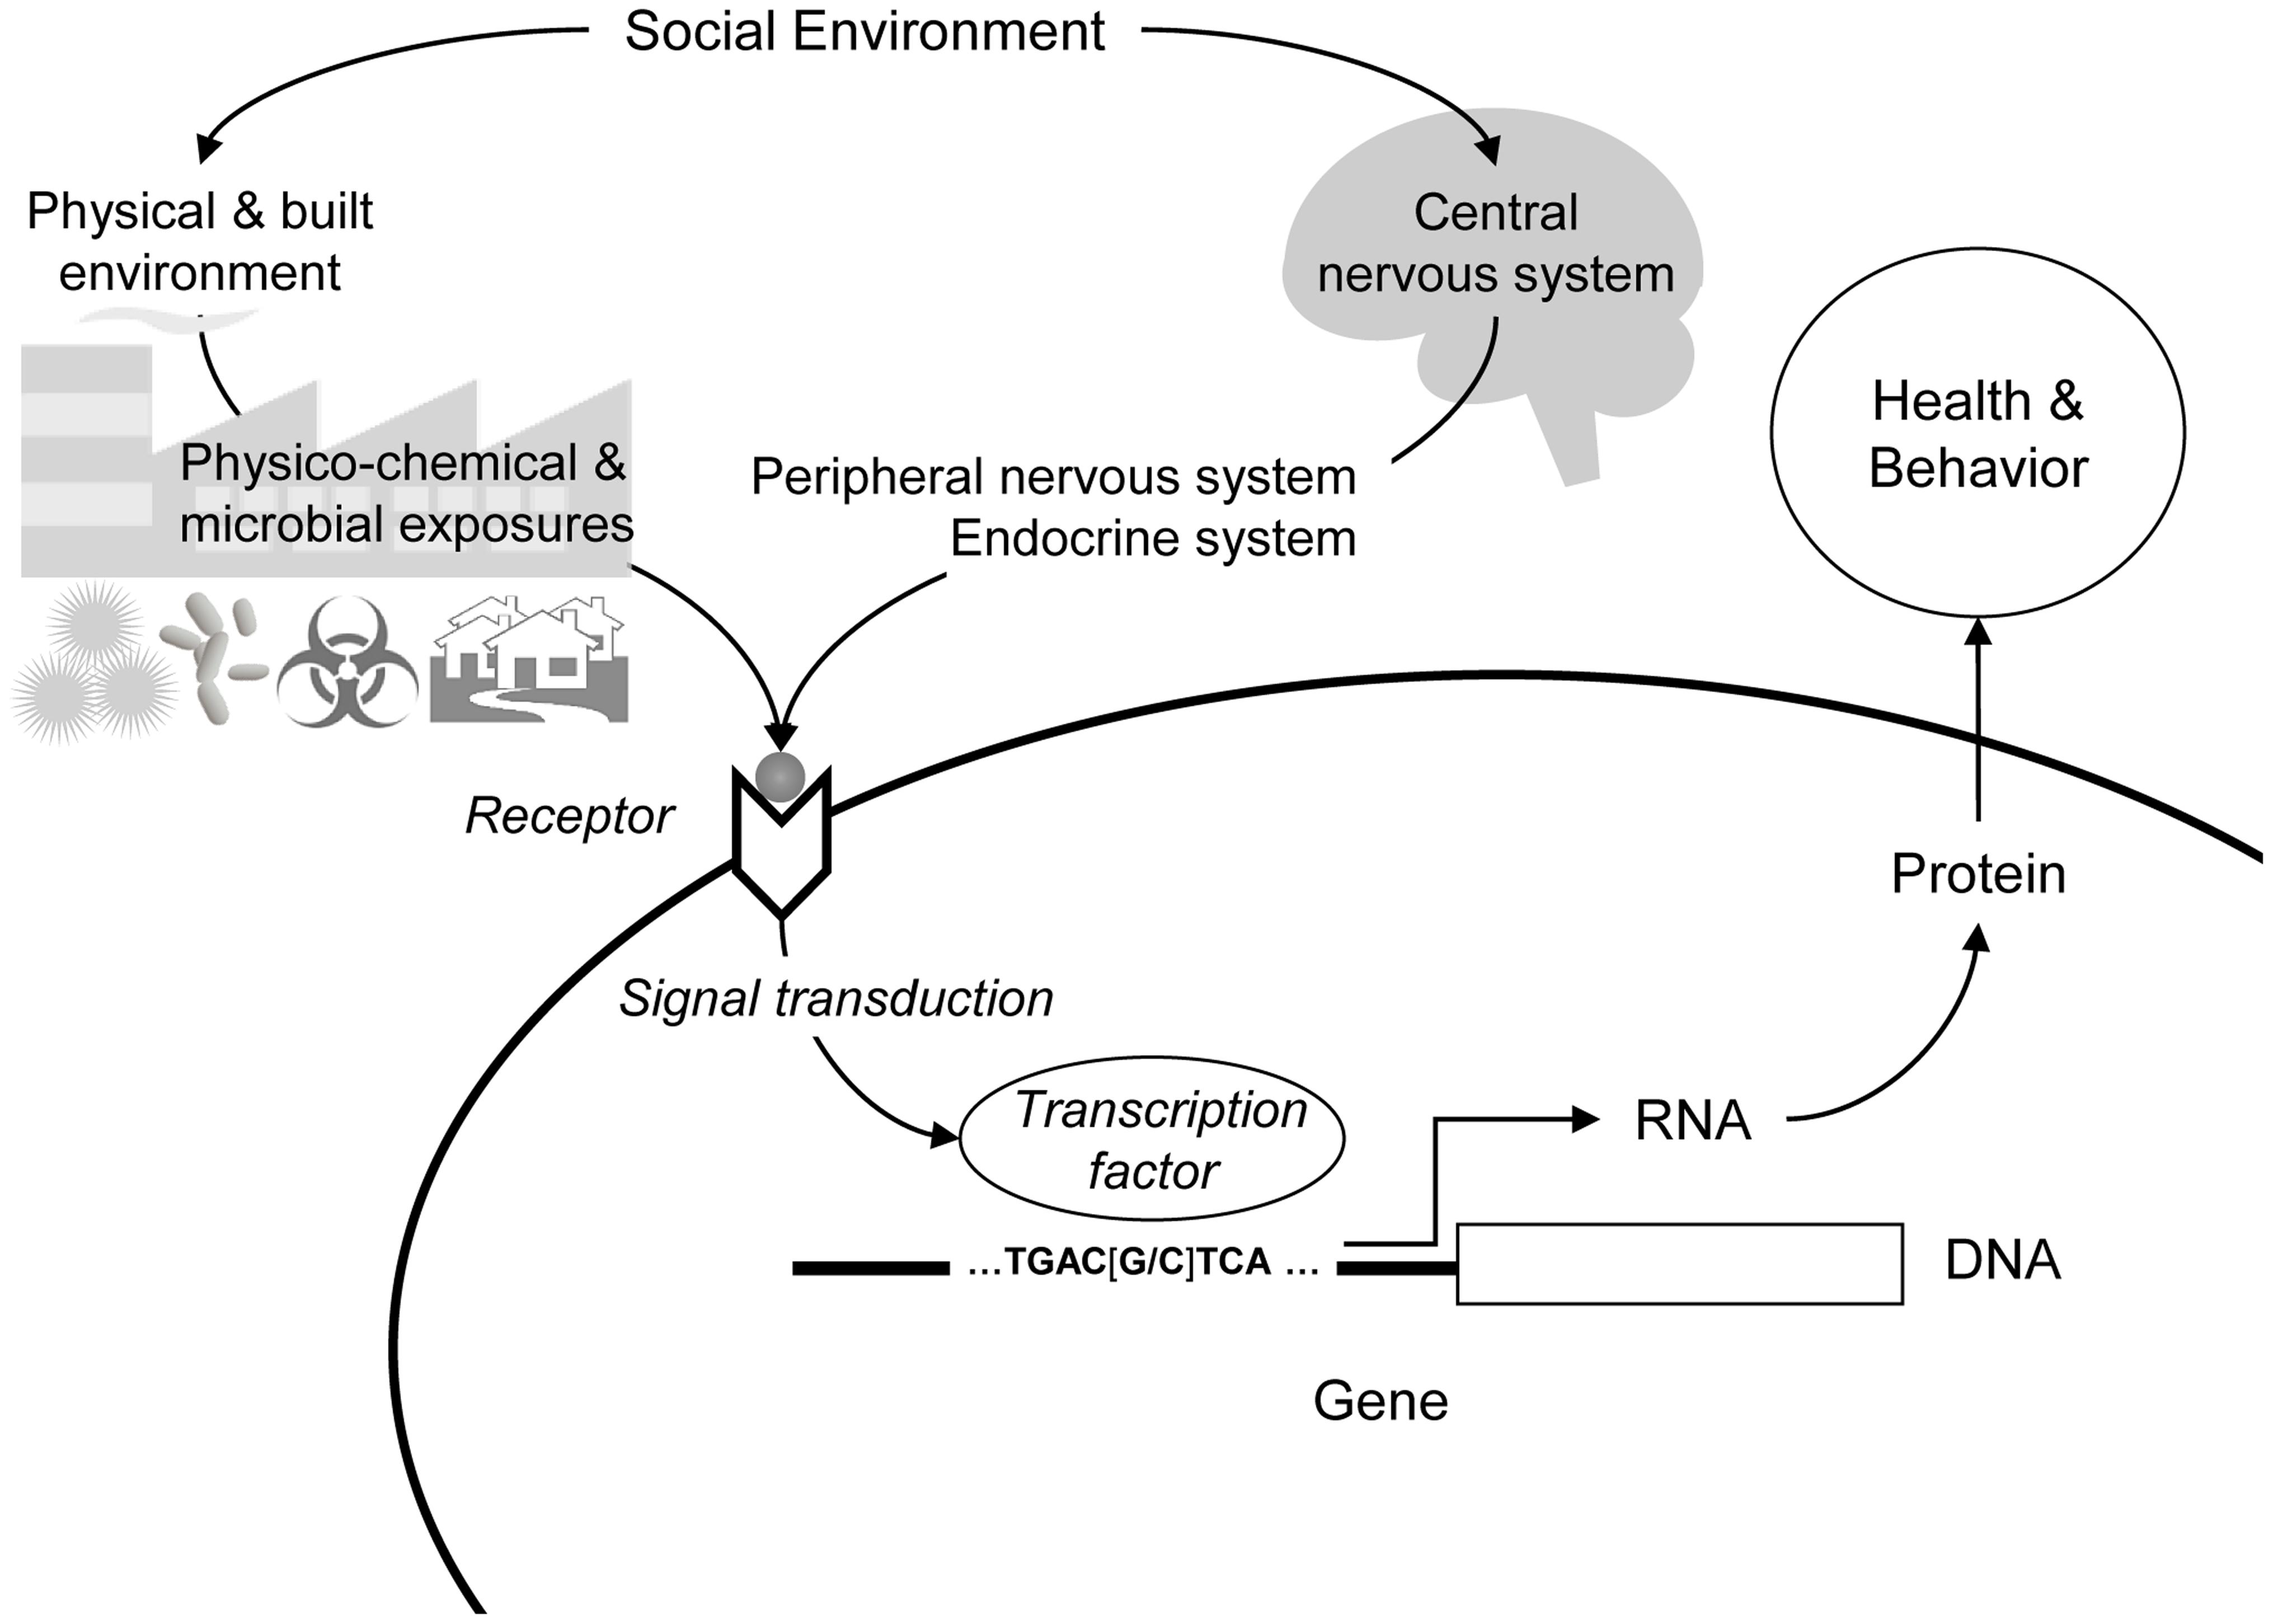 Social regulation of human gene expression.